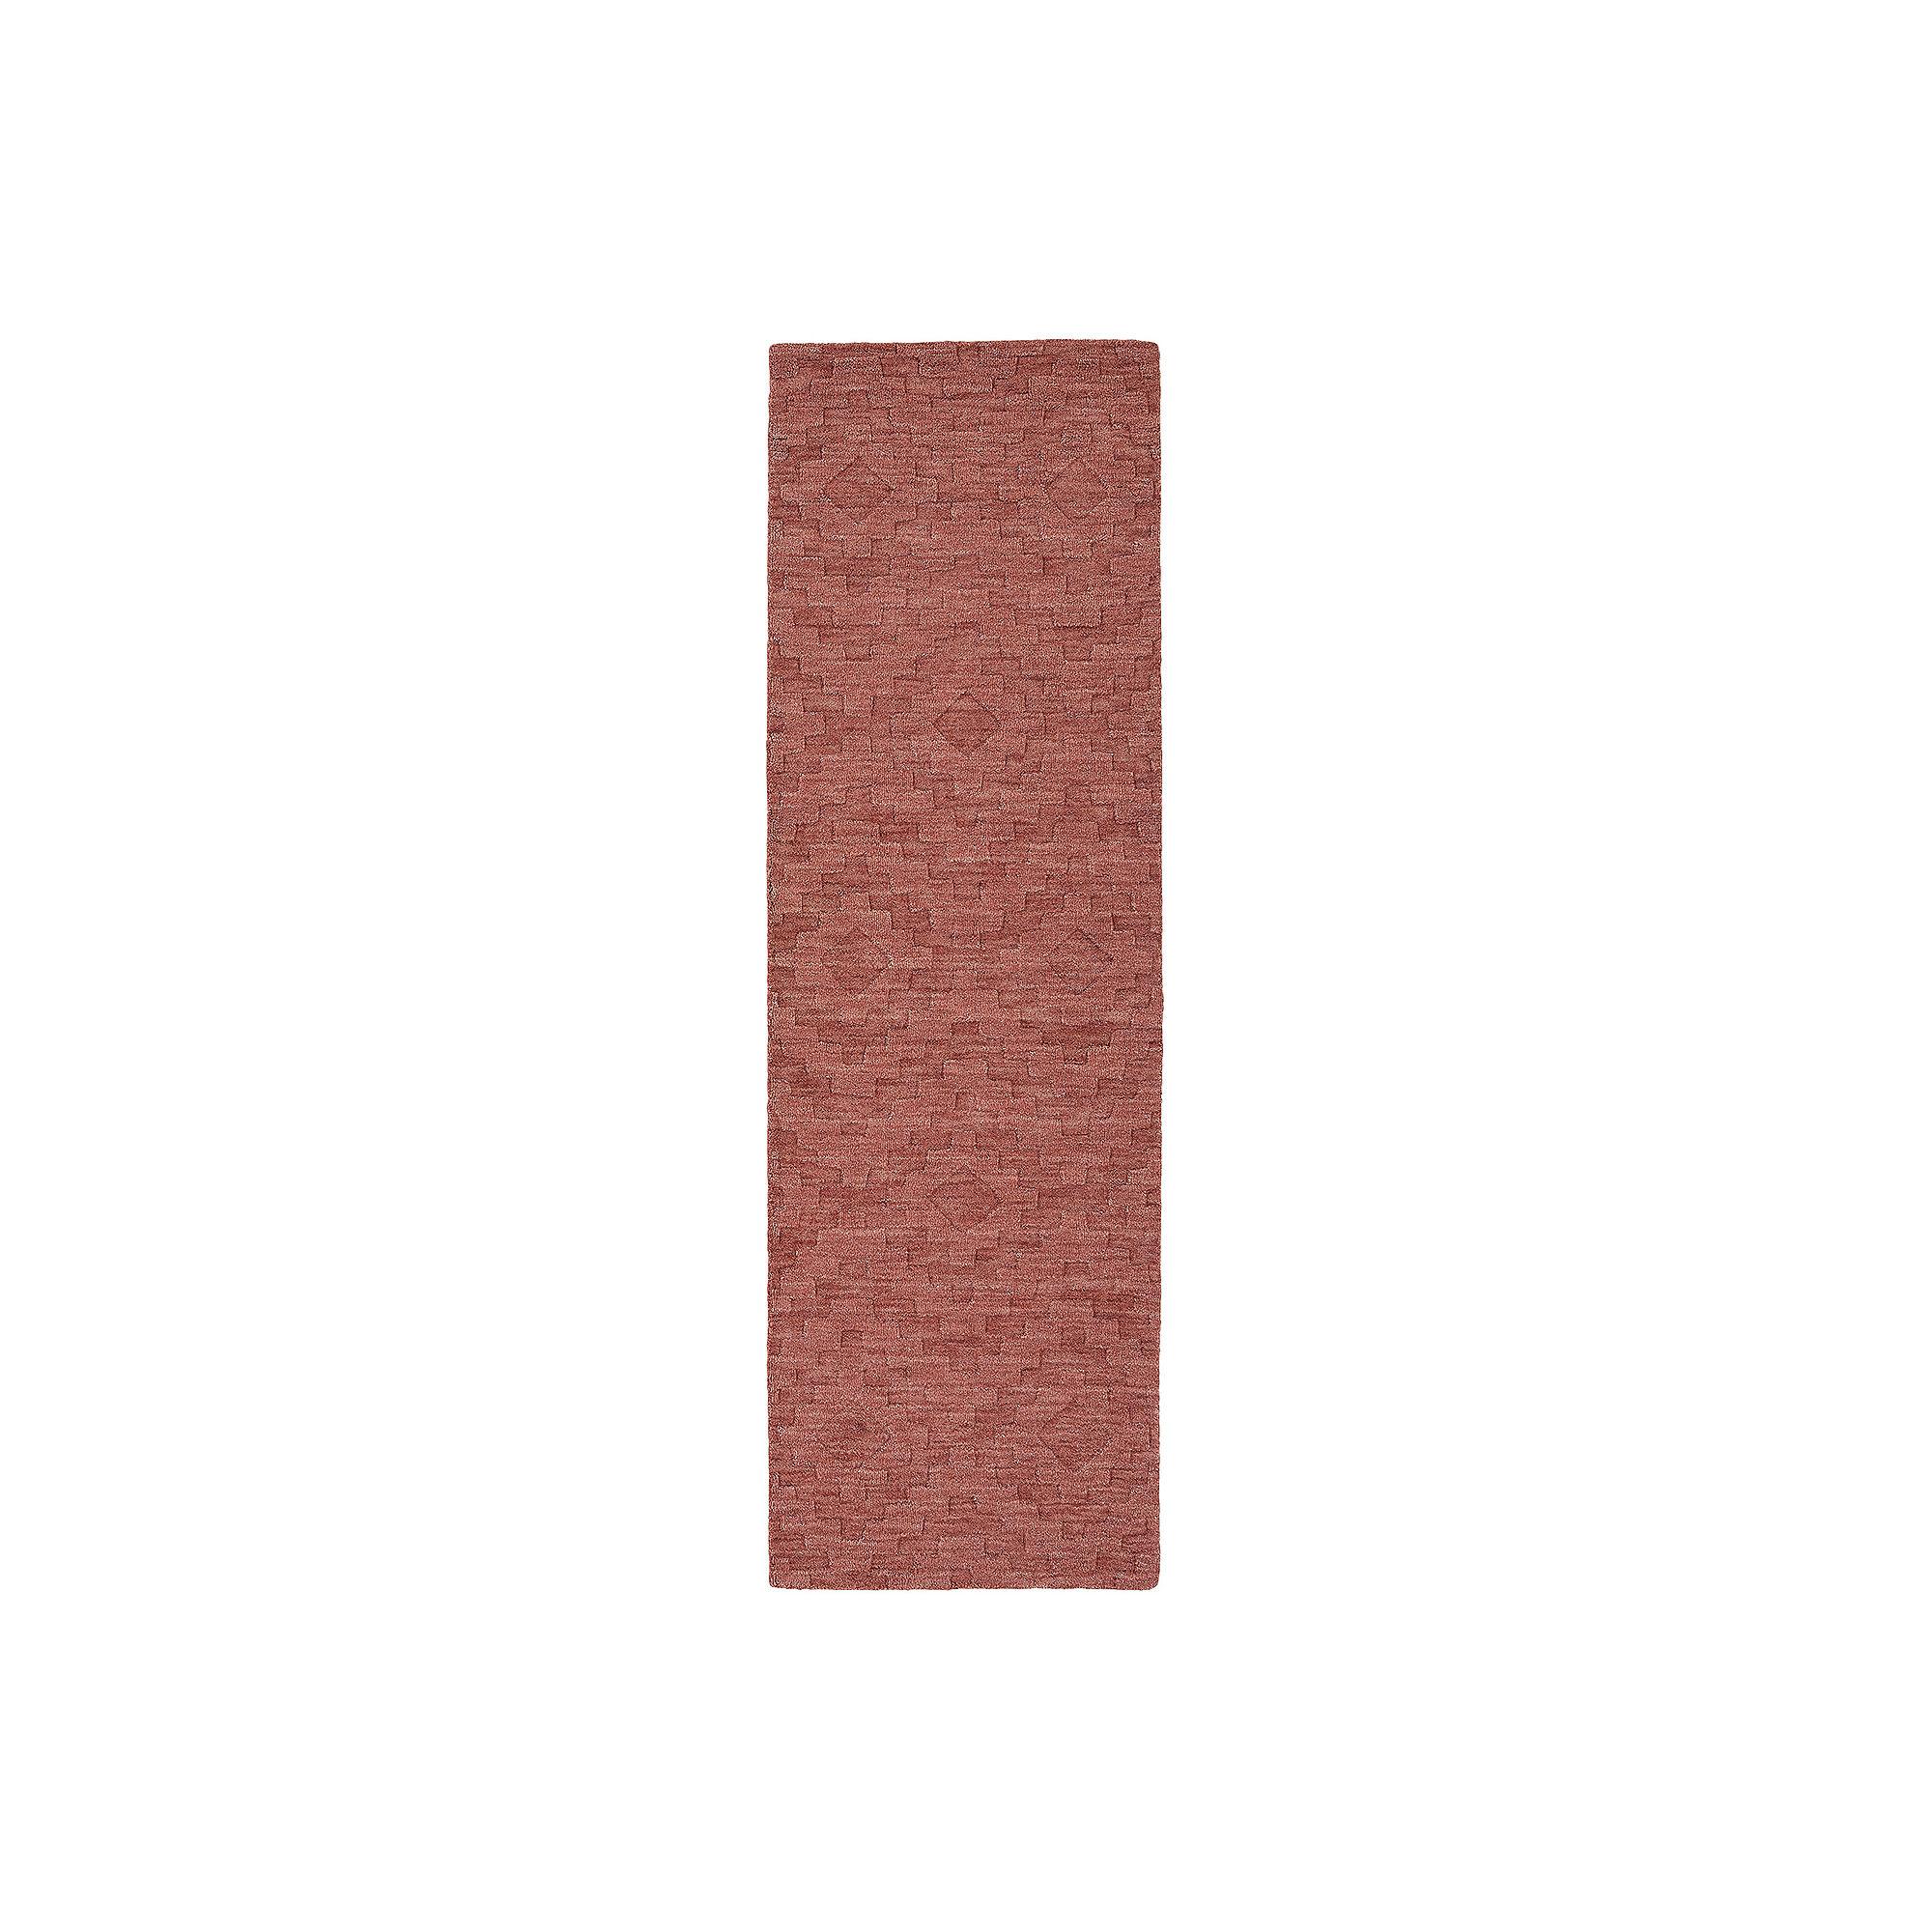 Kaleen Imprints Modern Tribal Rectangular Rug